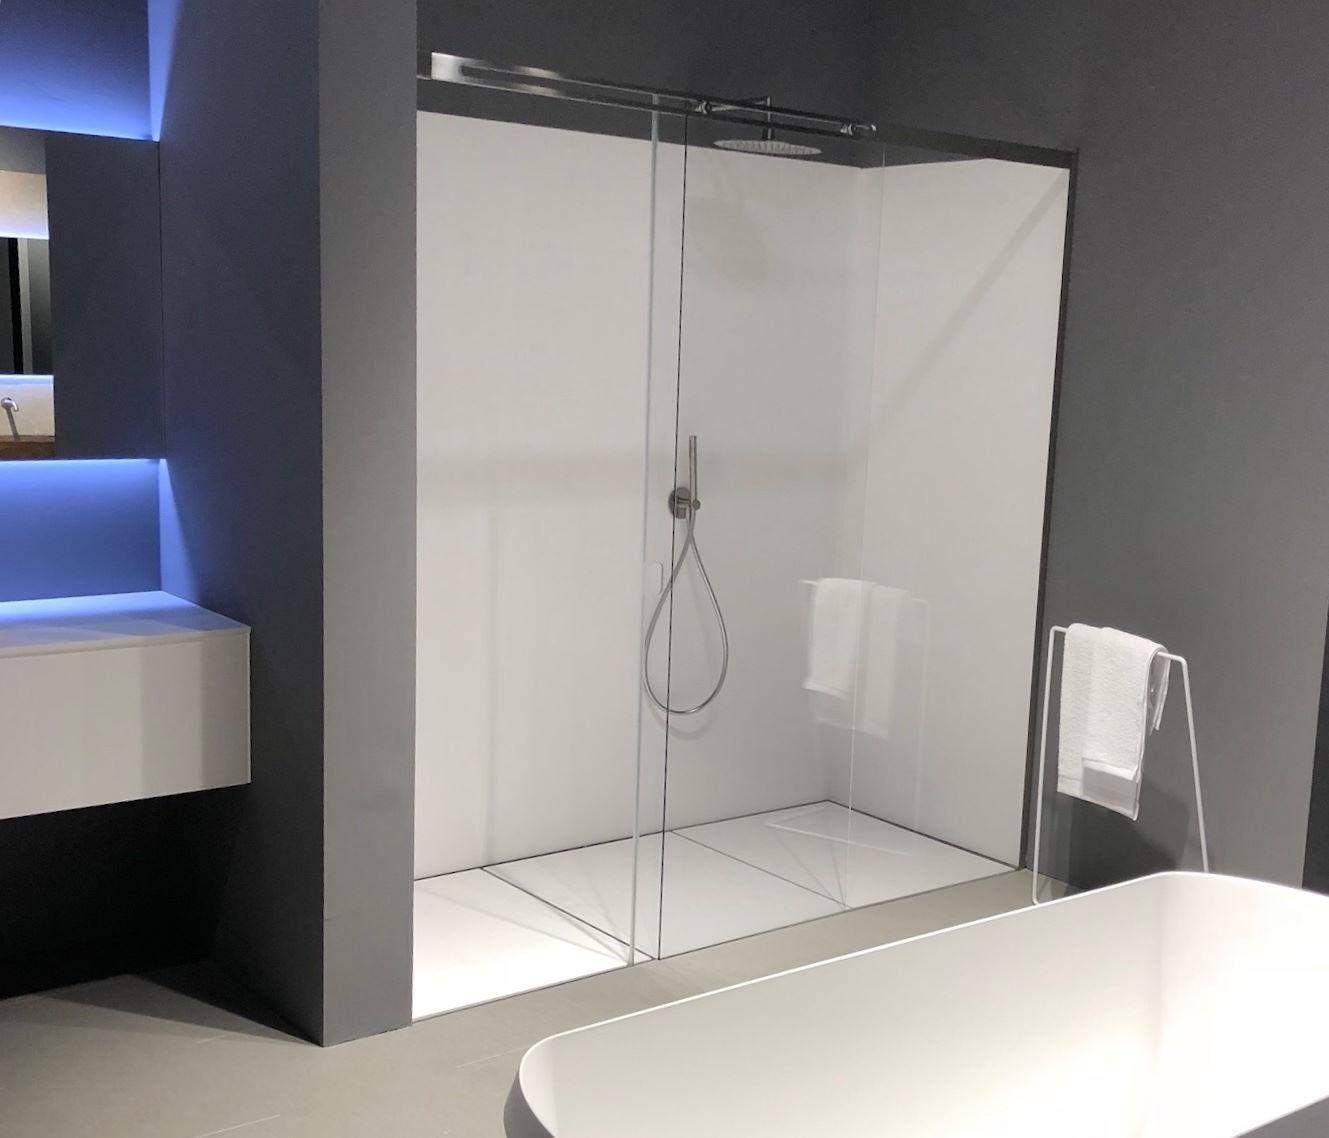 Assoluto sistema doccia - Silverplat